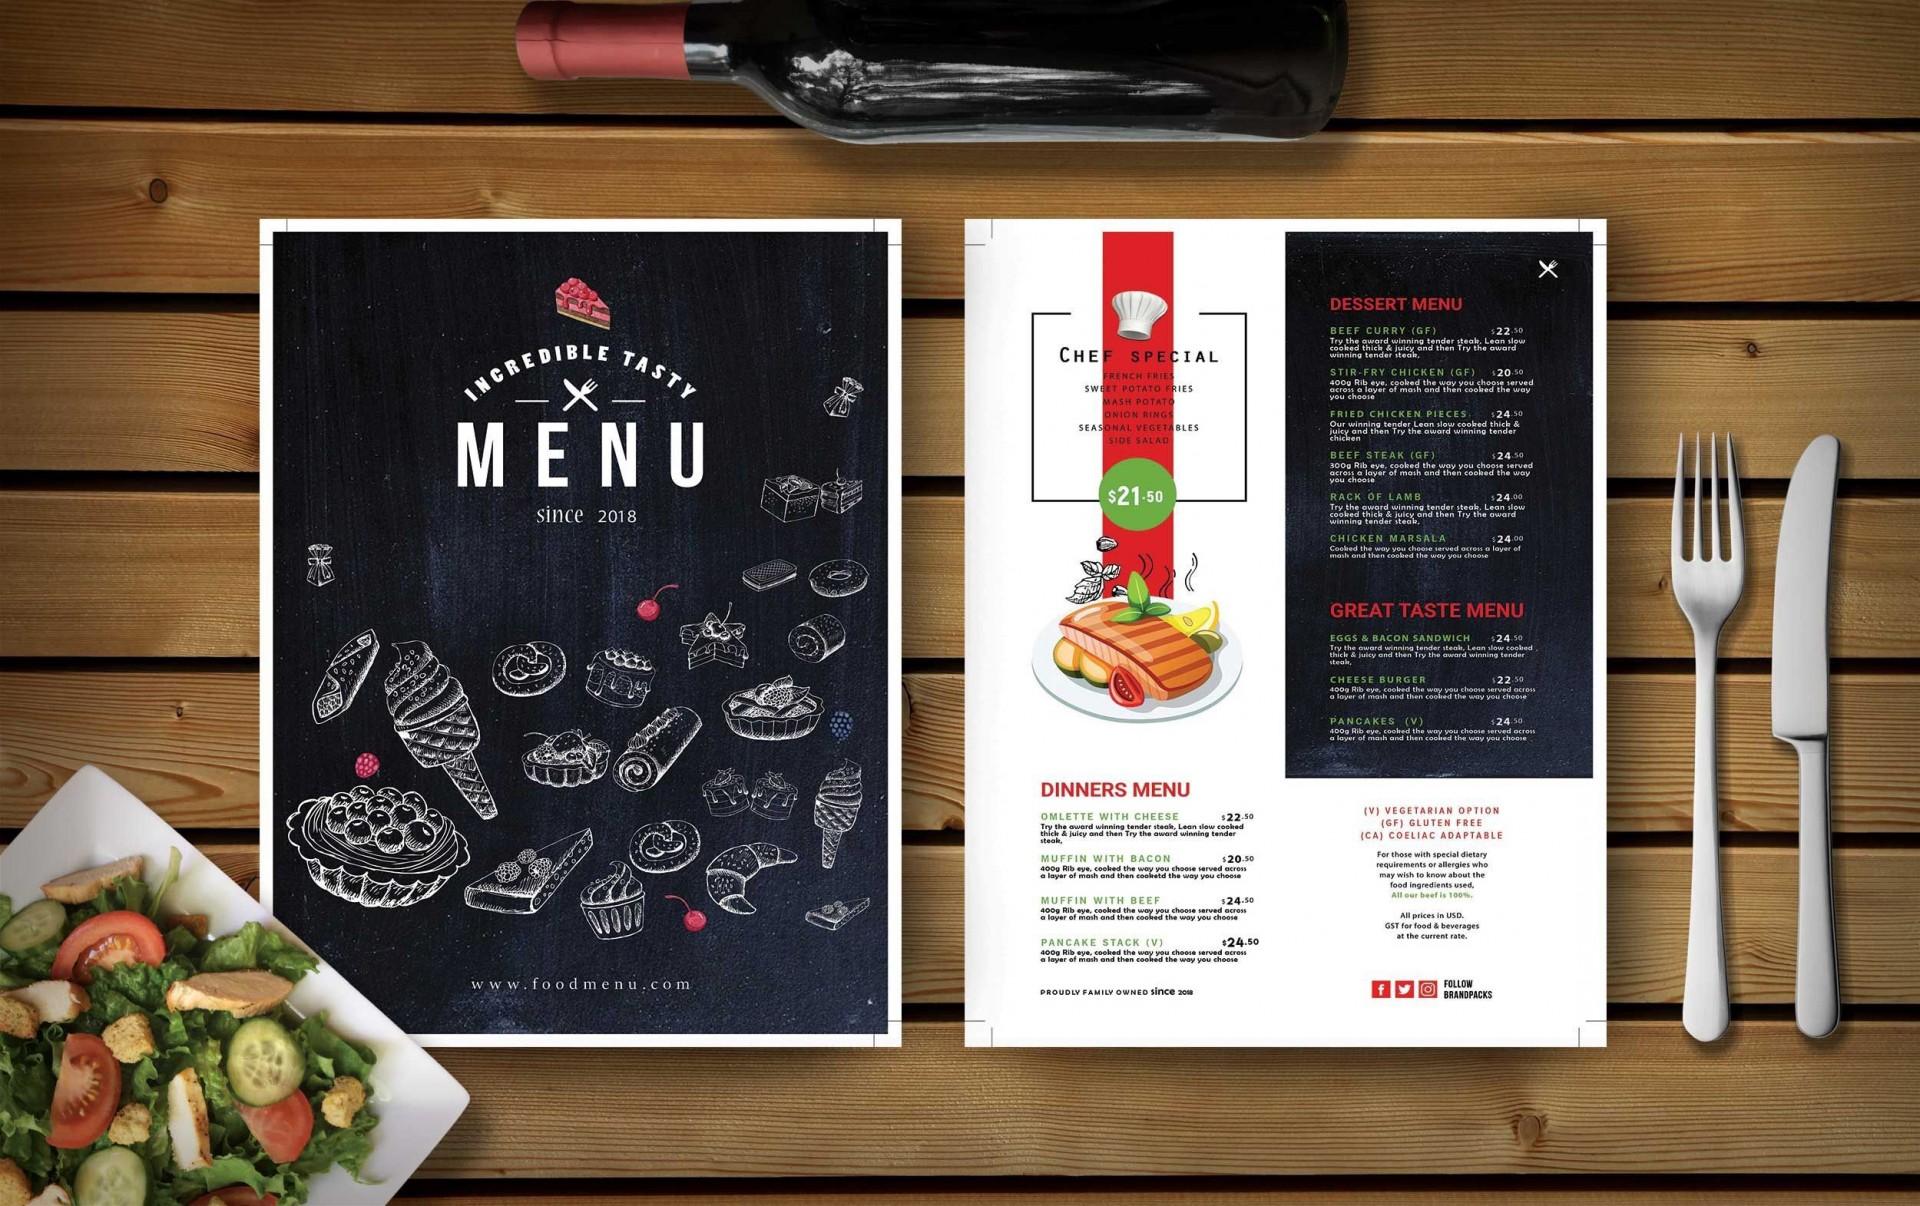 000 Impressive Restaurant Menu Template Free Download Psd Photo  Design1920